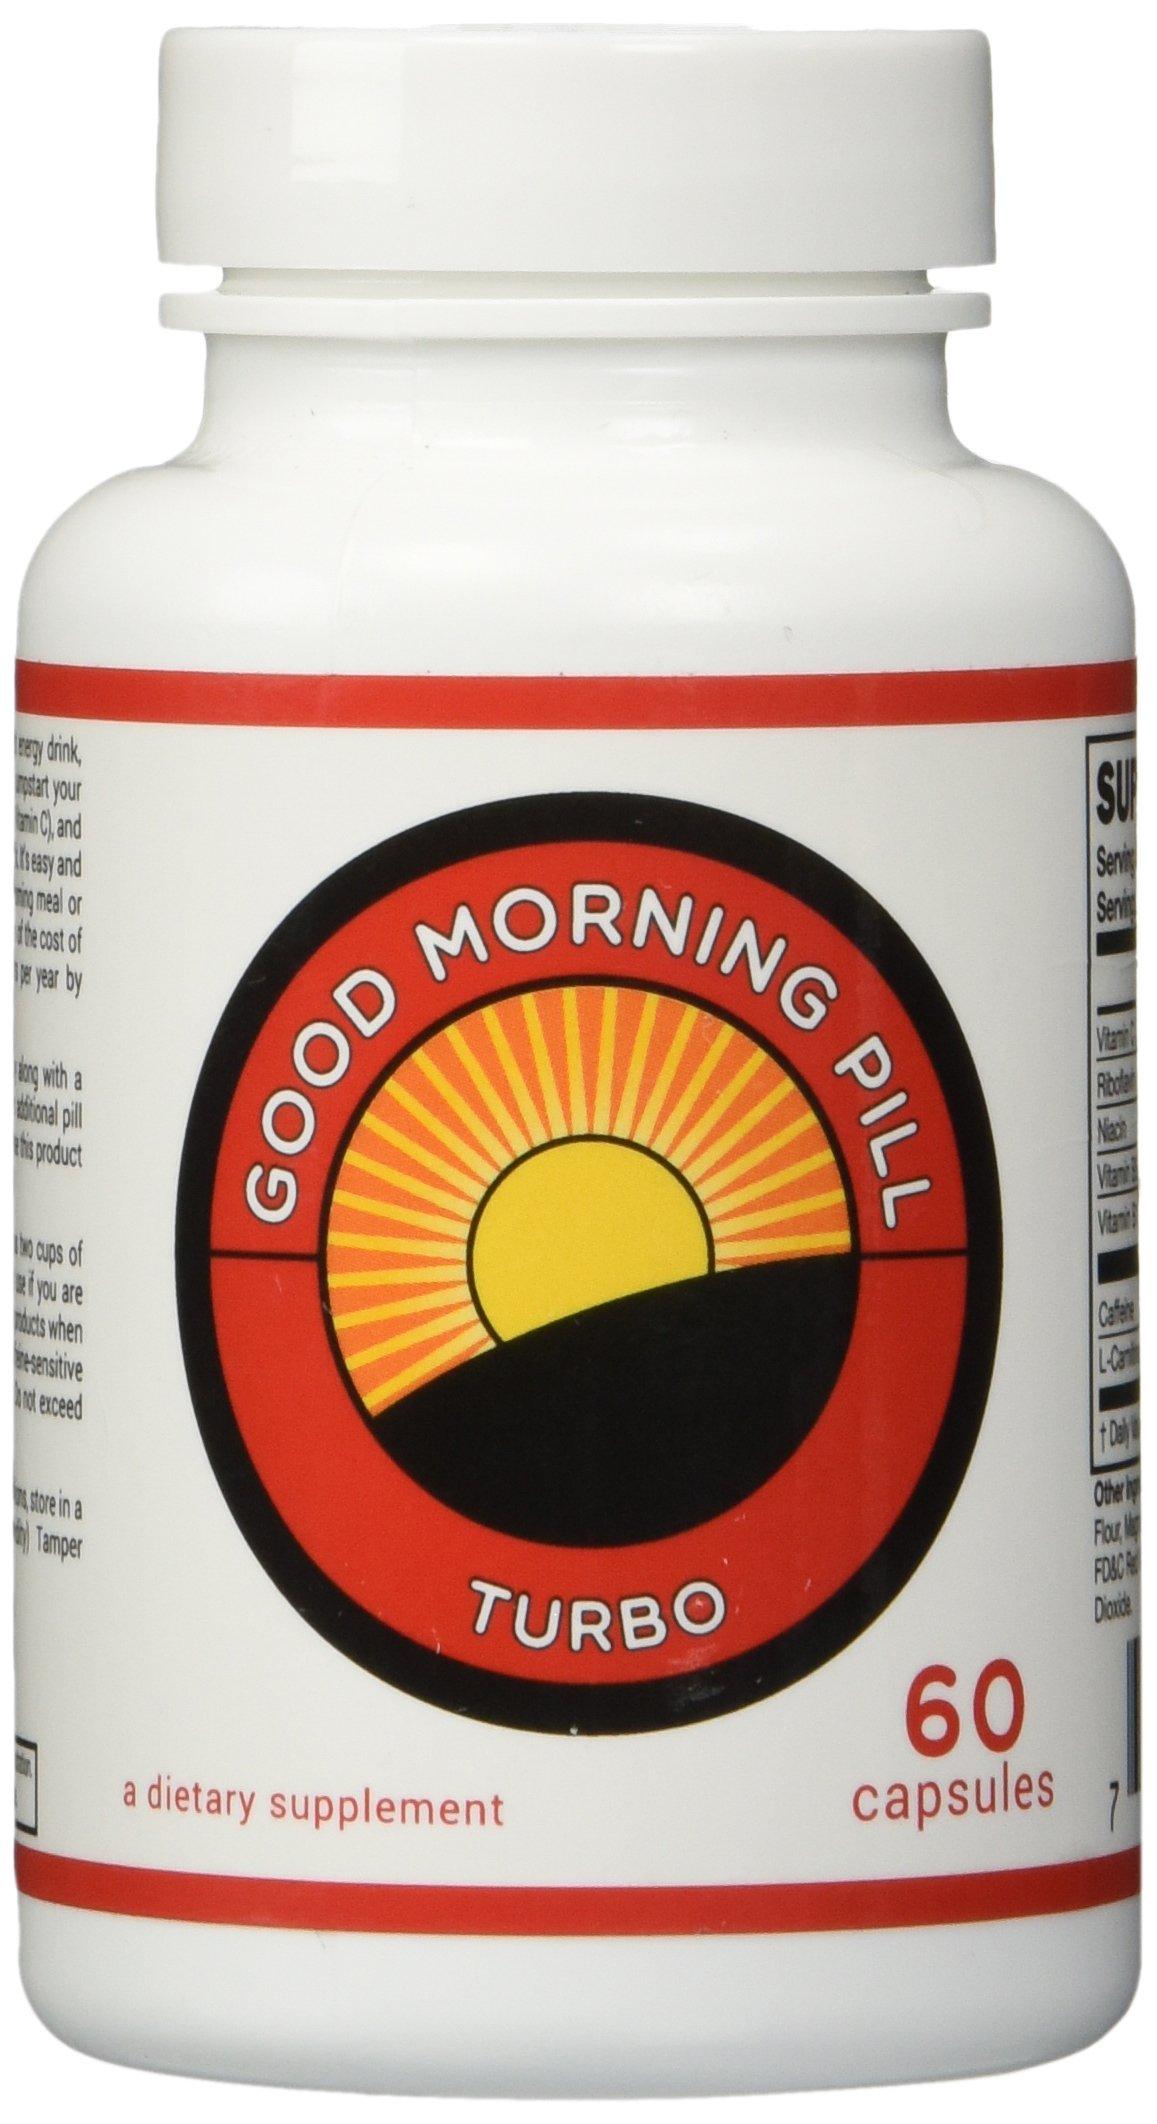 Good Morning Pill Turbo - 200mg Caffeine Pills - Extra Strength Energy Supplement  (60 Capsules)